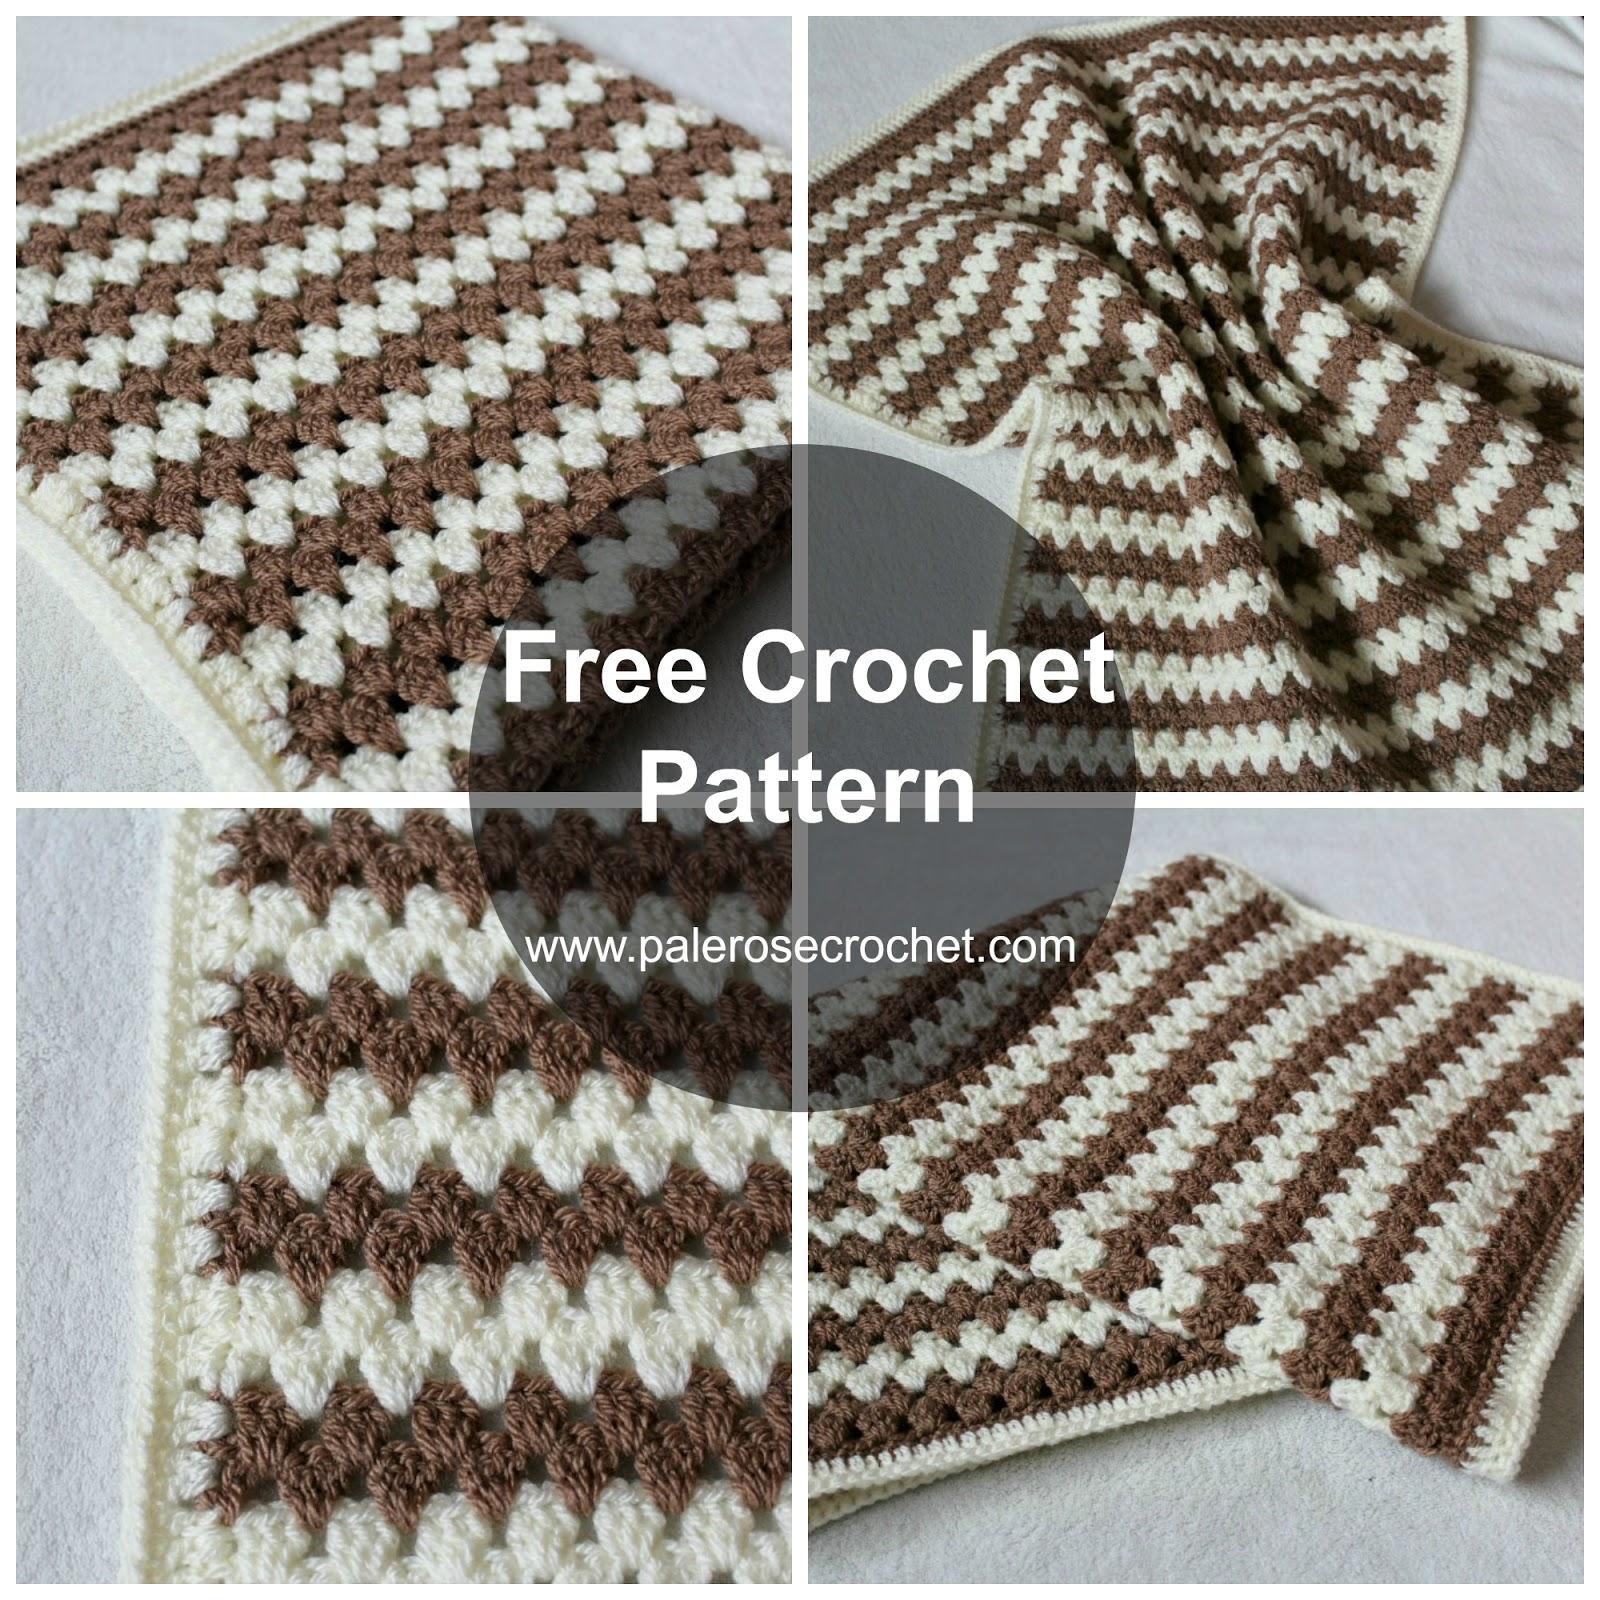 Crochet Granny Stripe Baby Blanket Pattern : Crochet Patterns Galore - Granny Stripe Baby Blanket